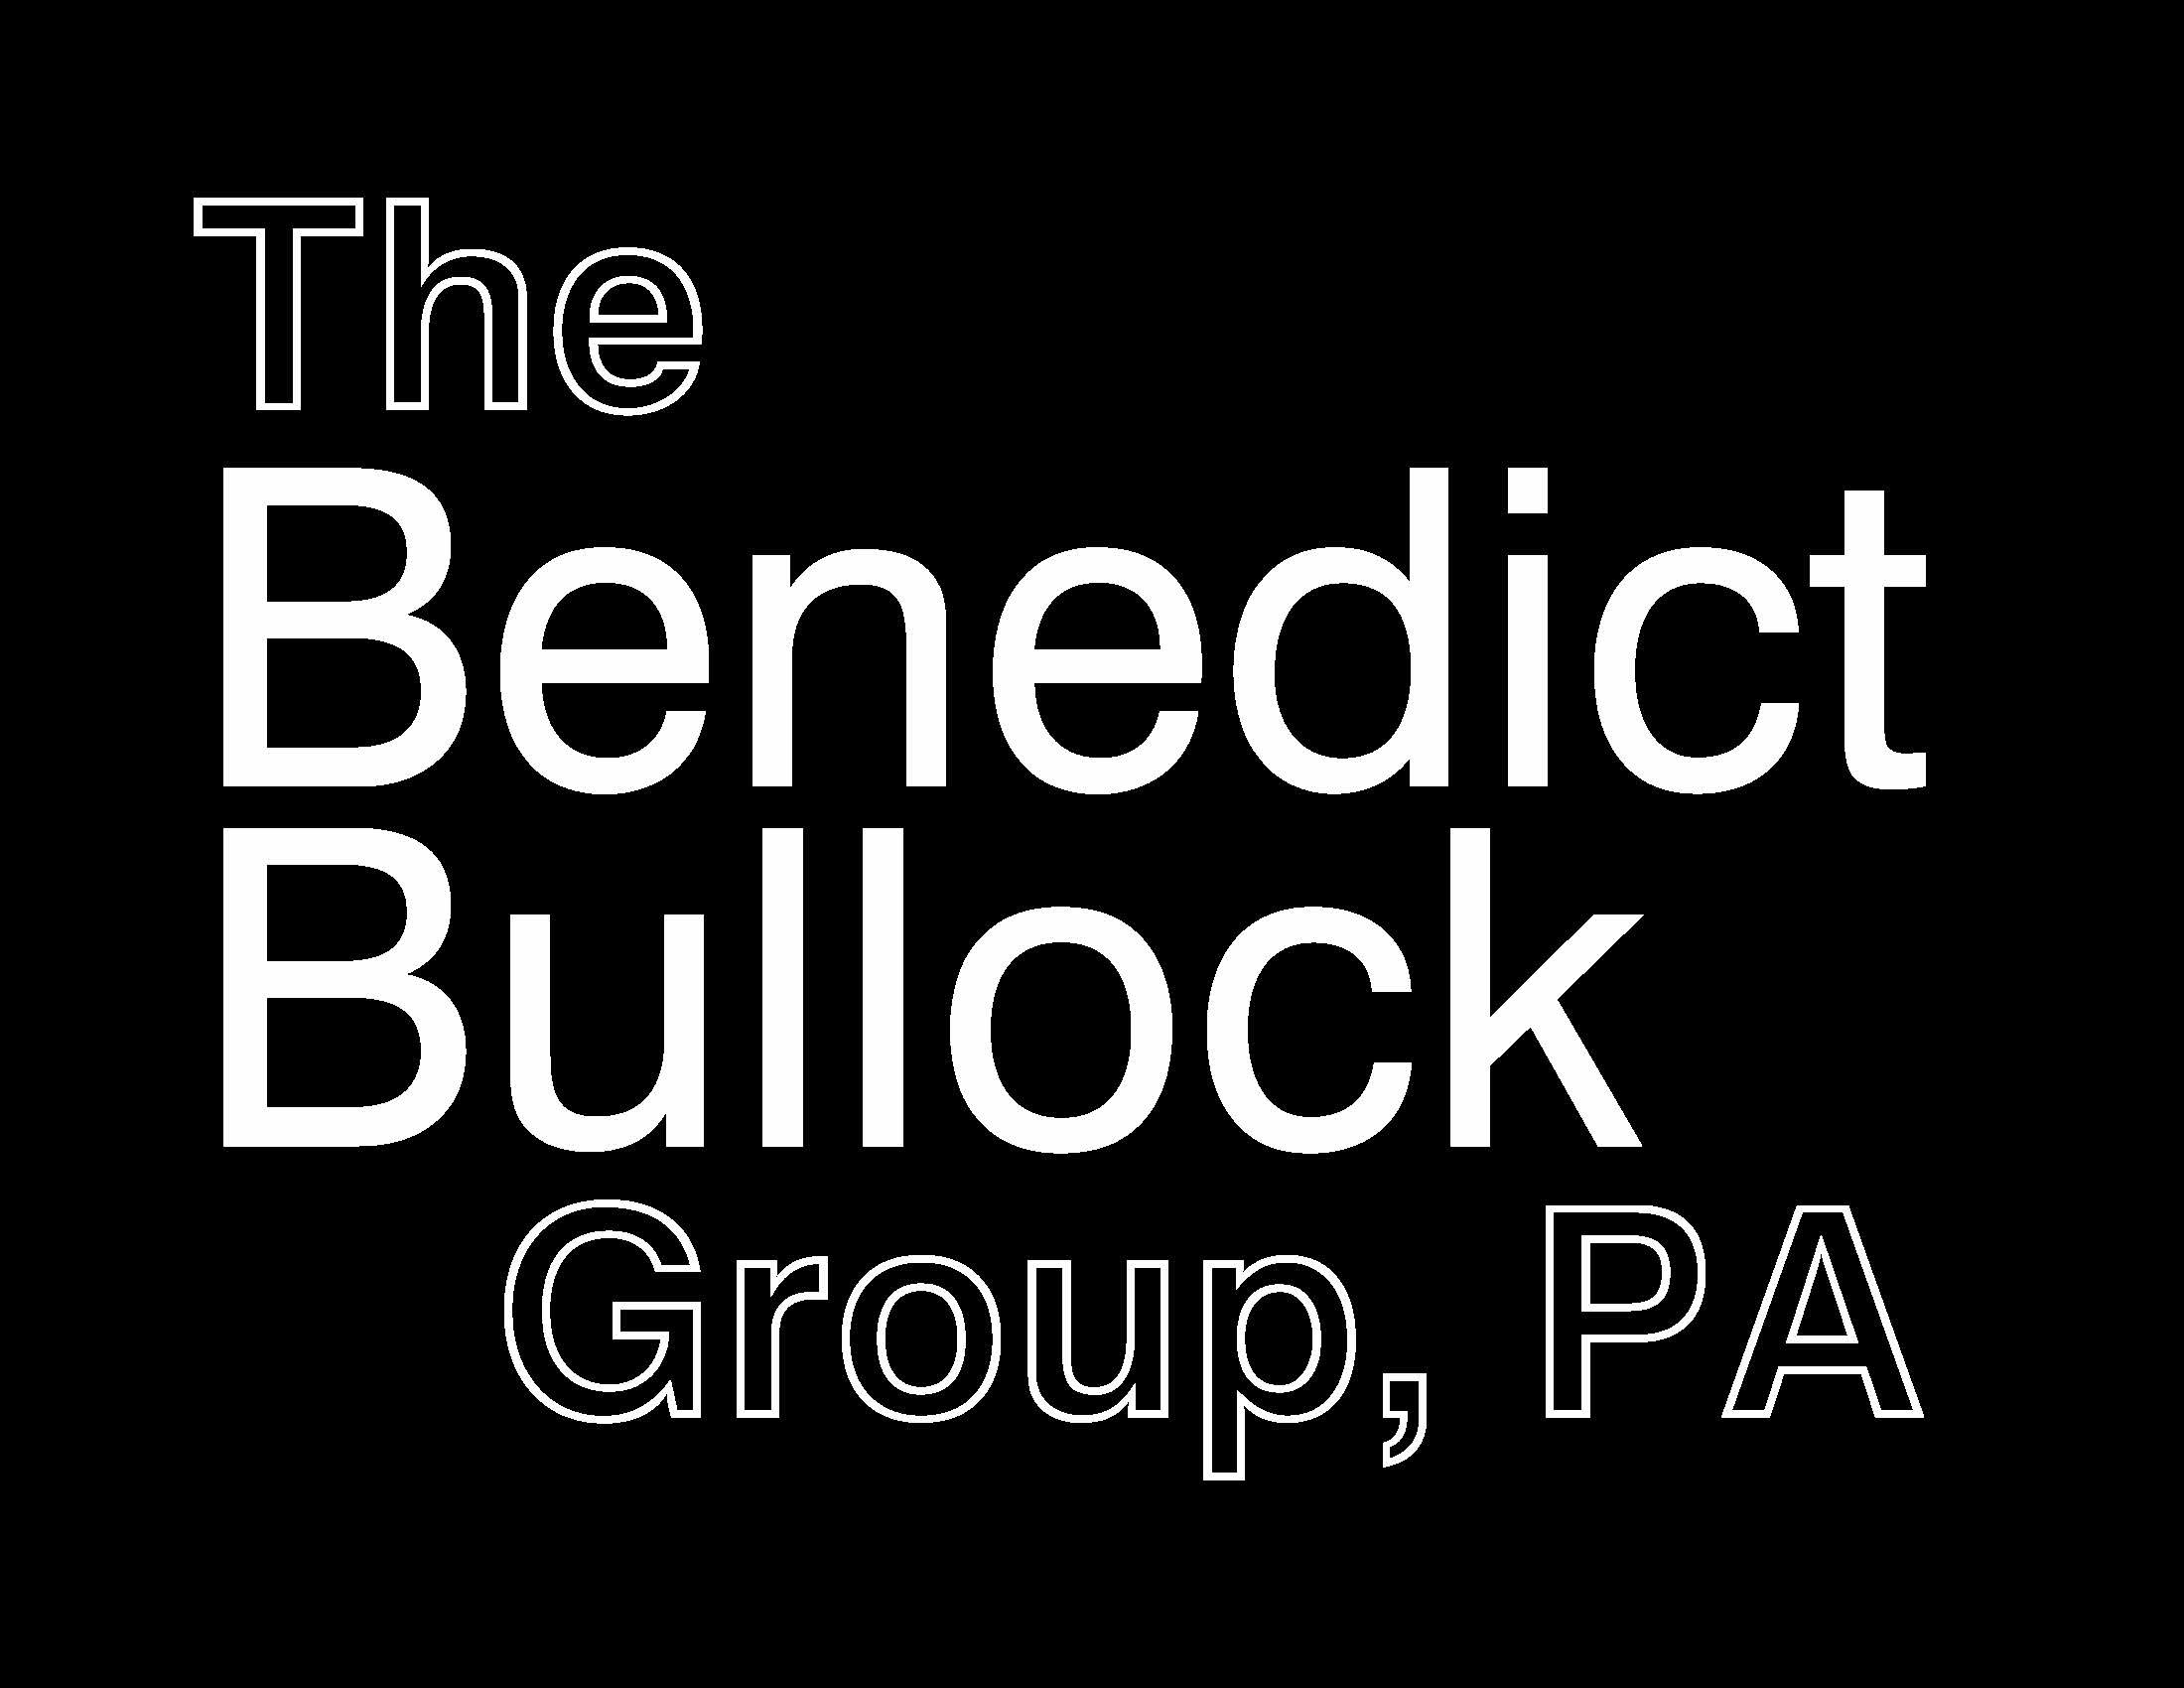 The Benedict Bullock Group, PA